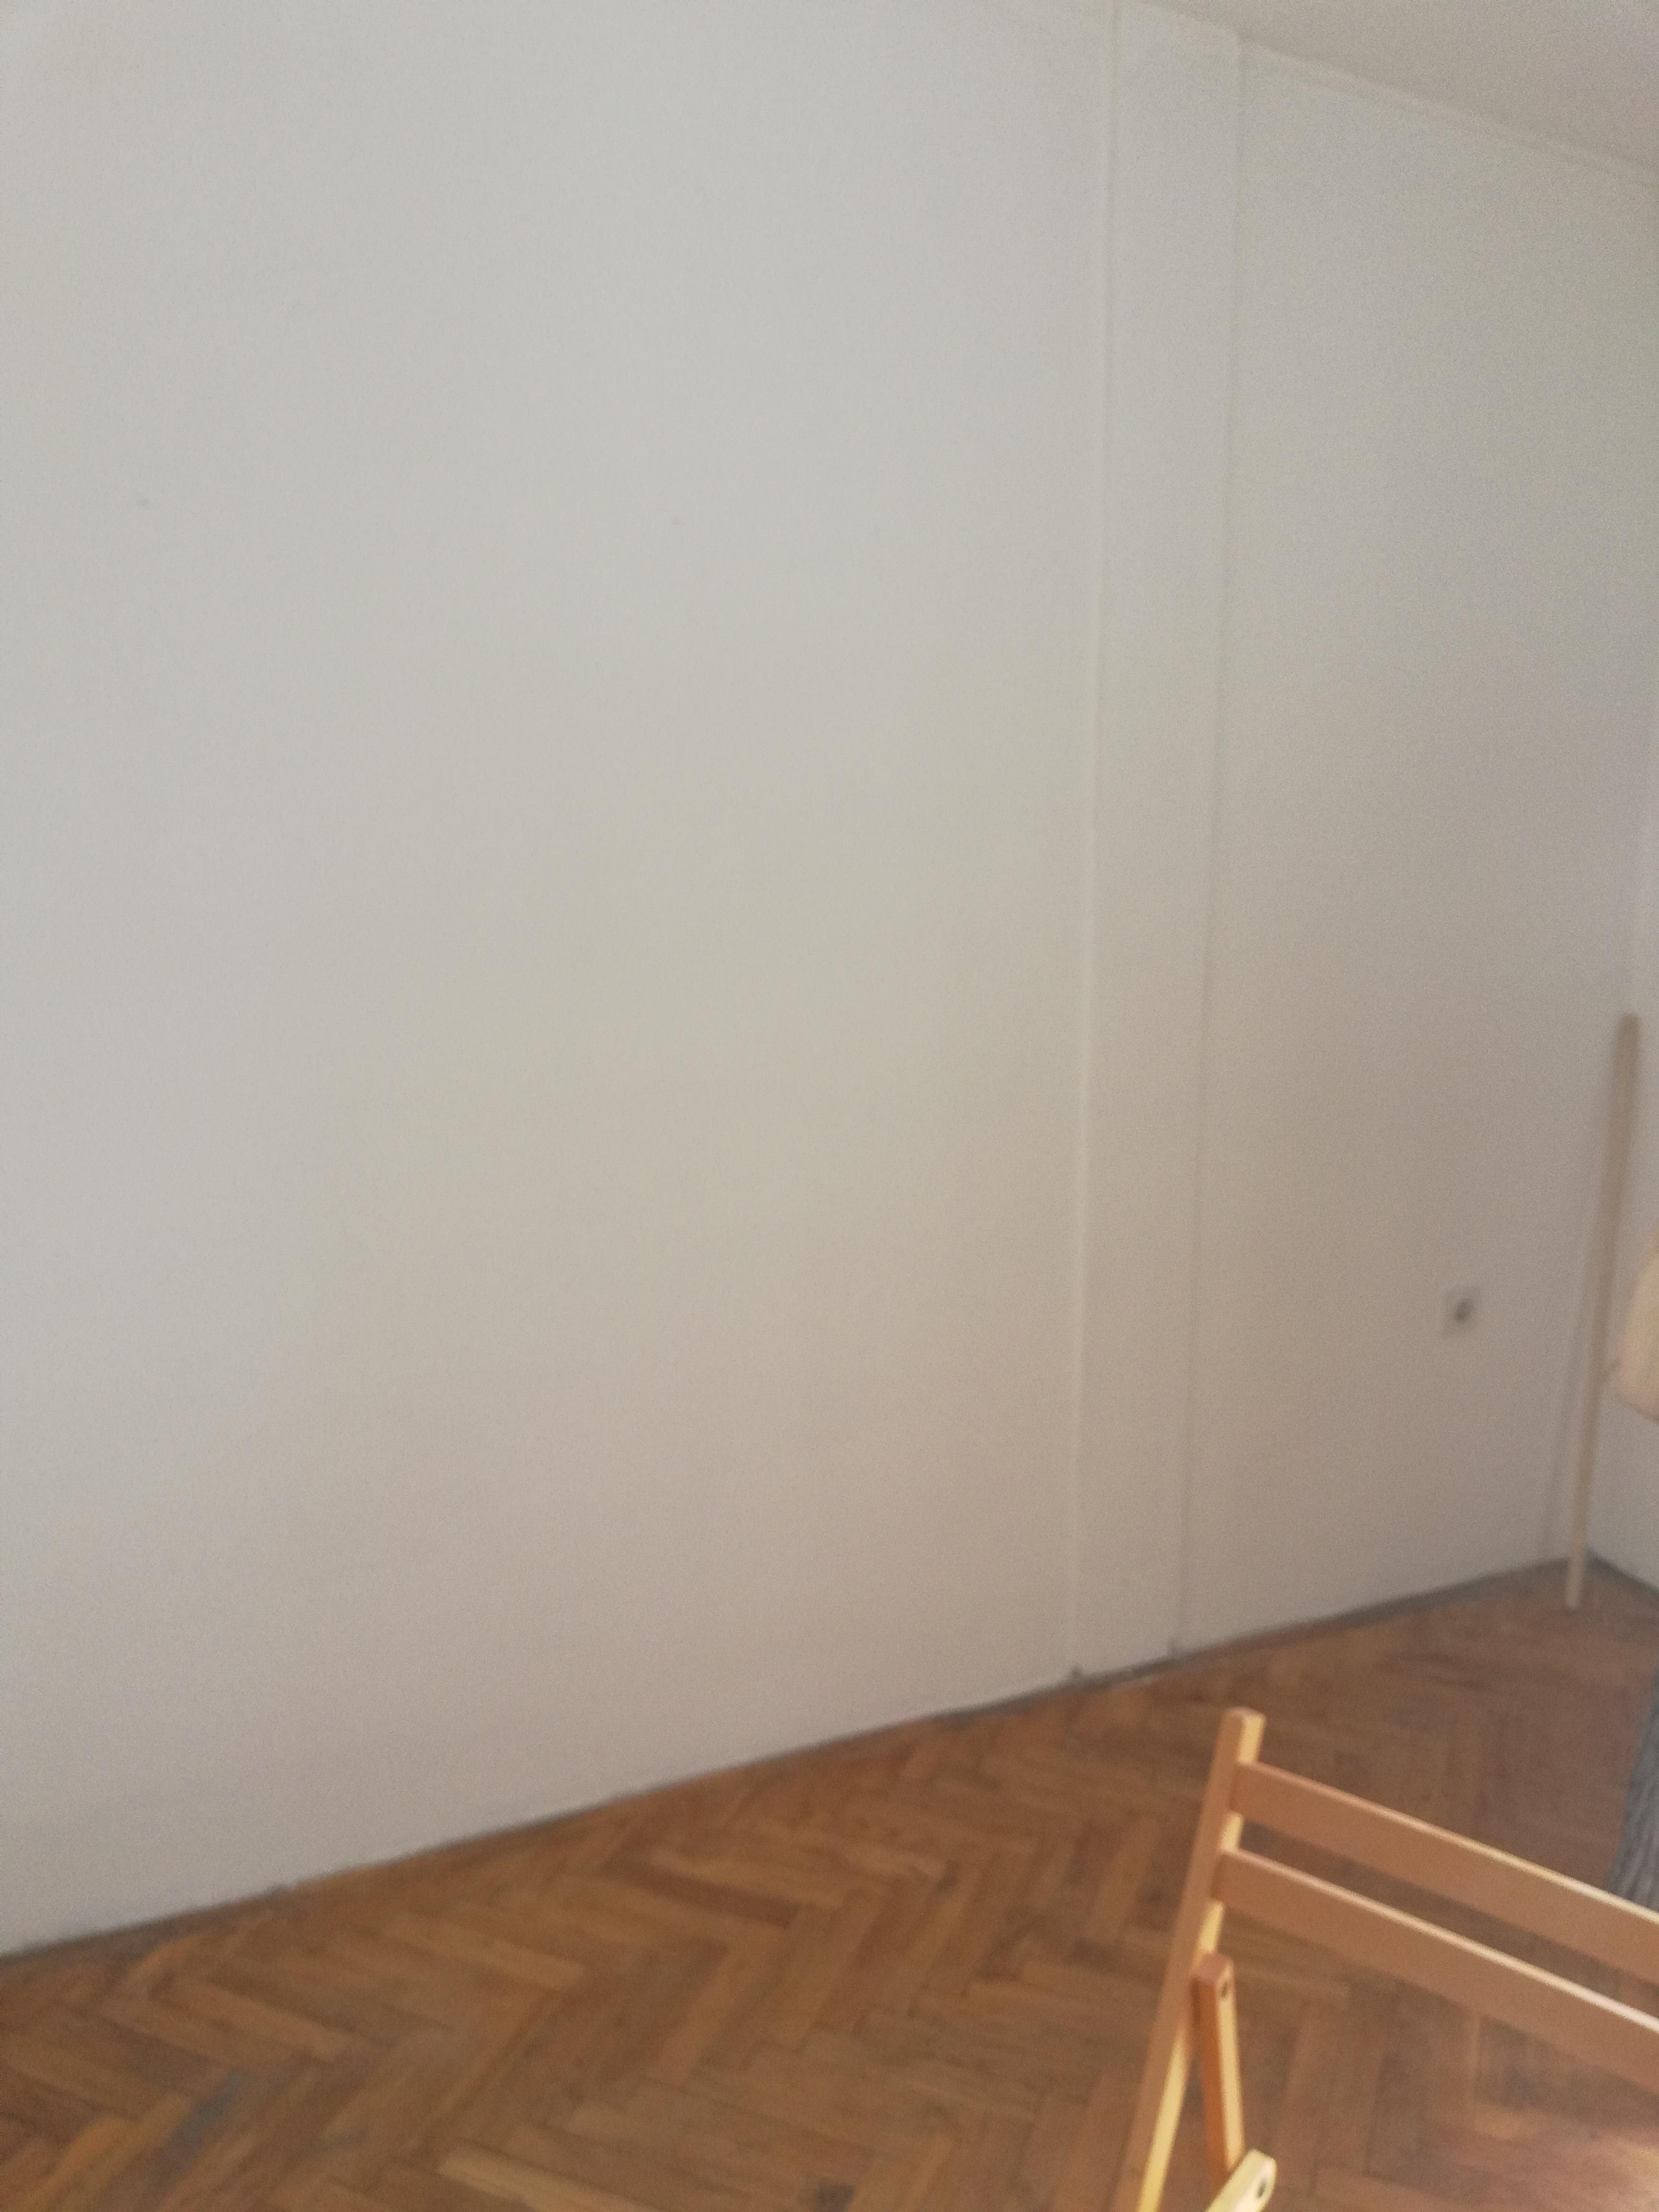 Stan 58 m2, IV, u centru Inđije